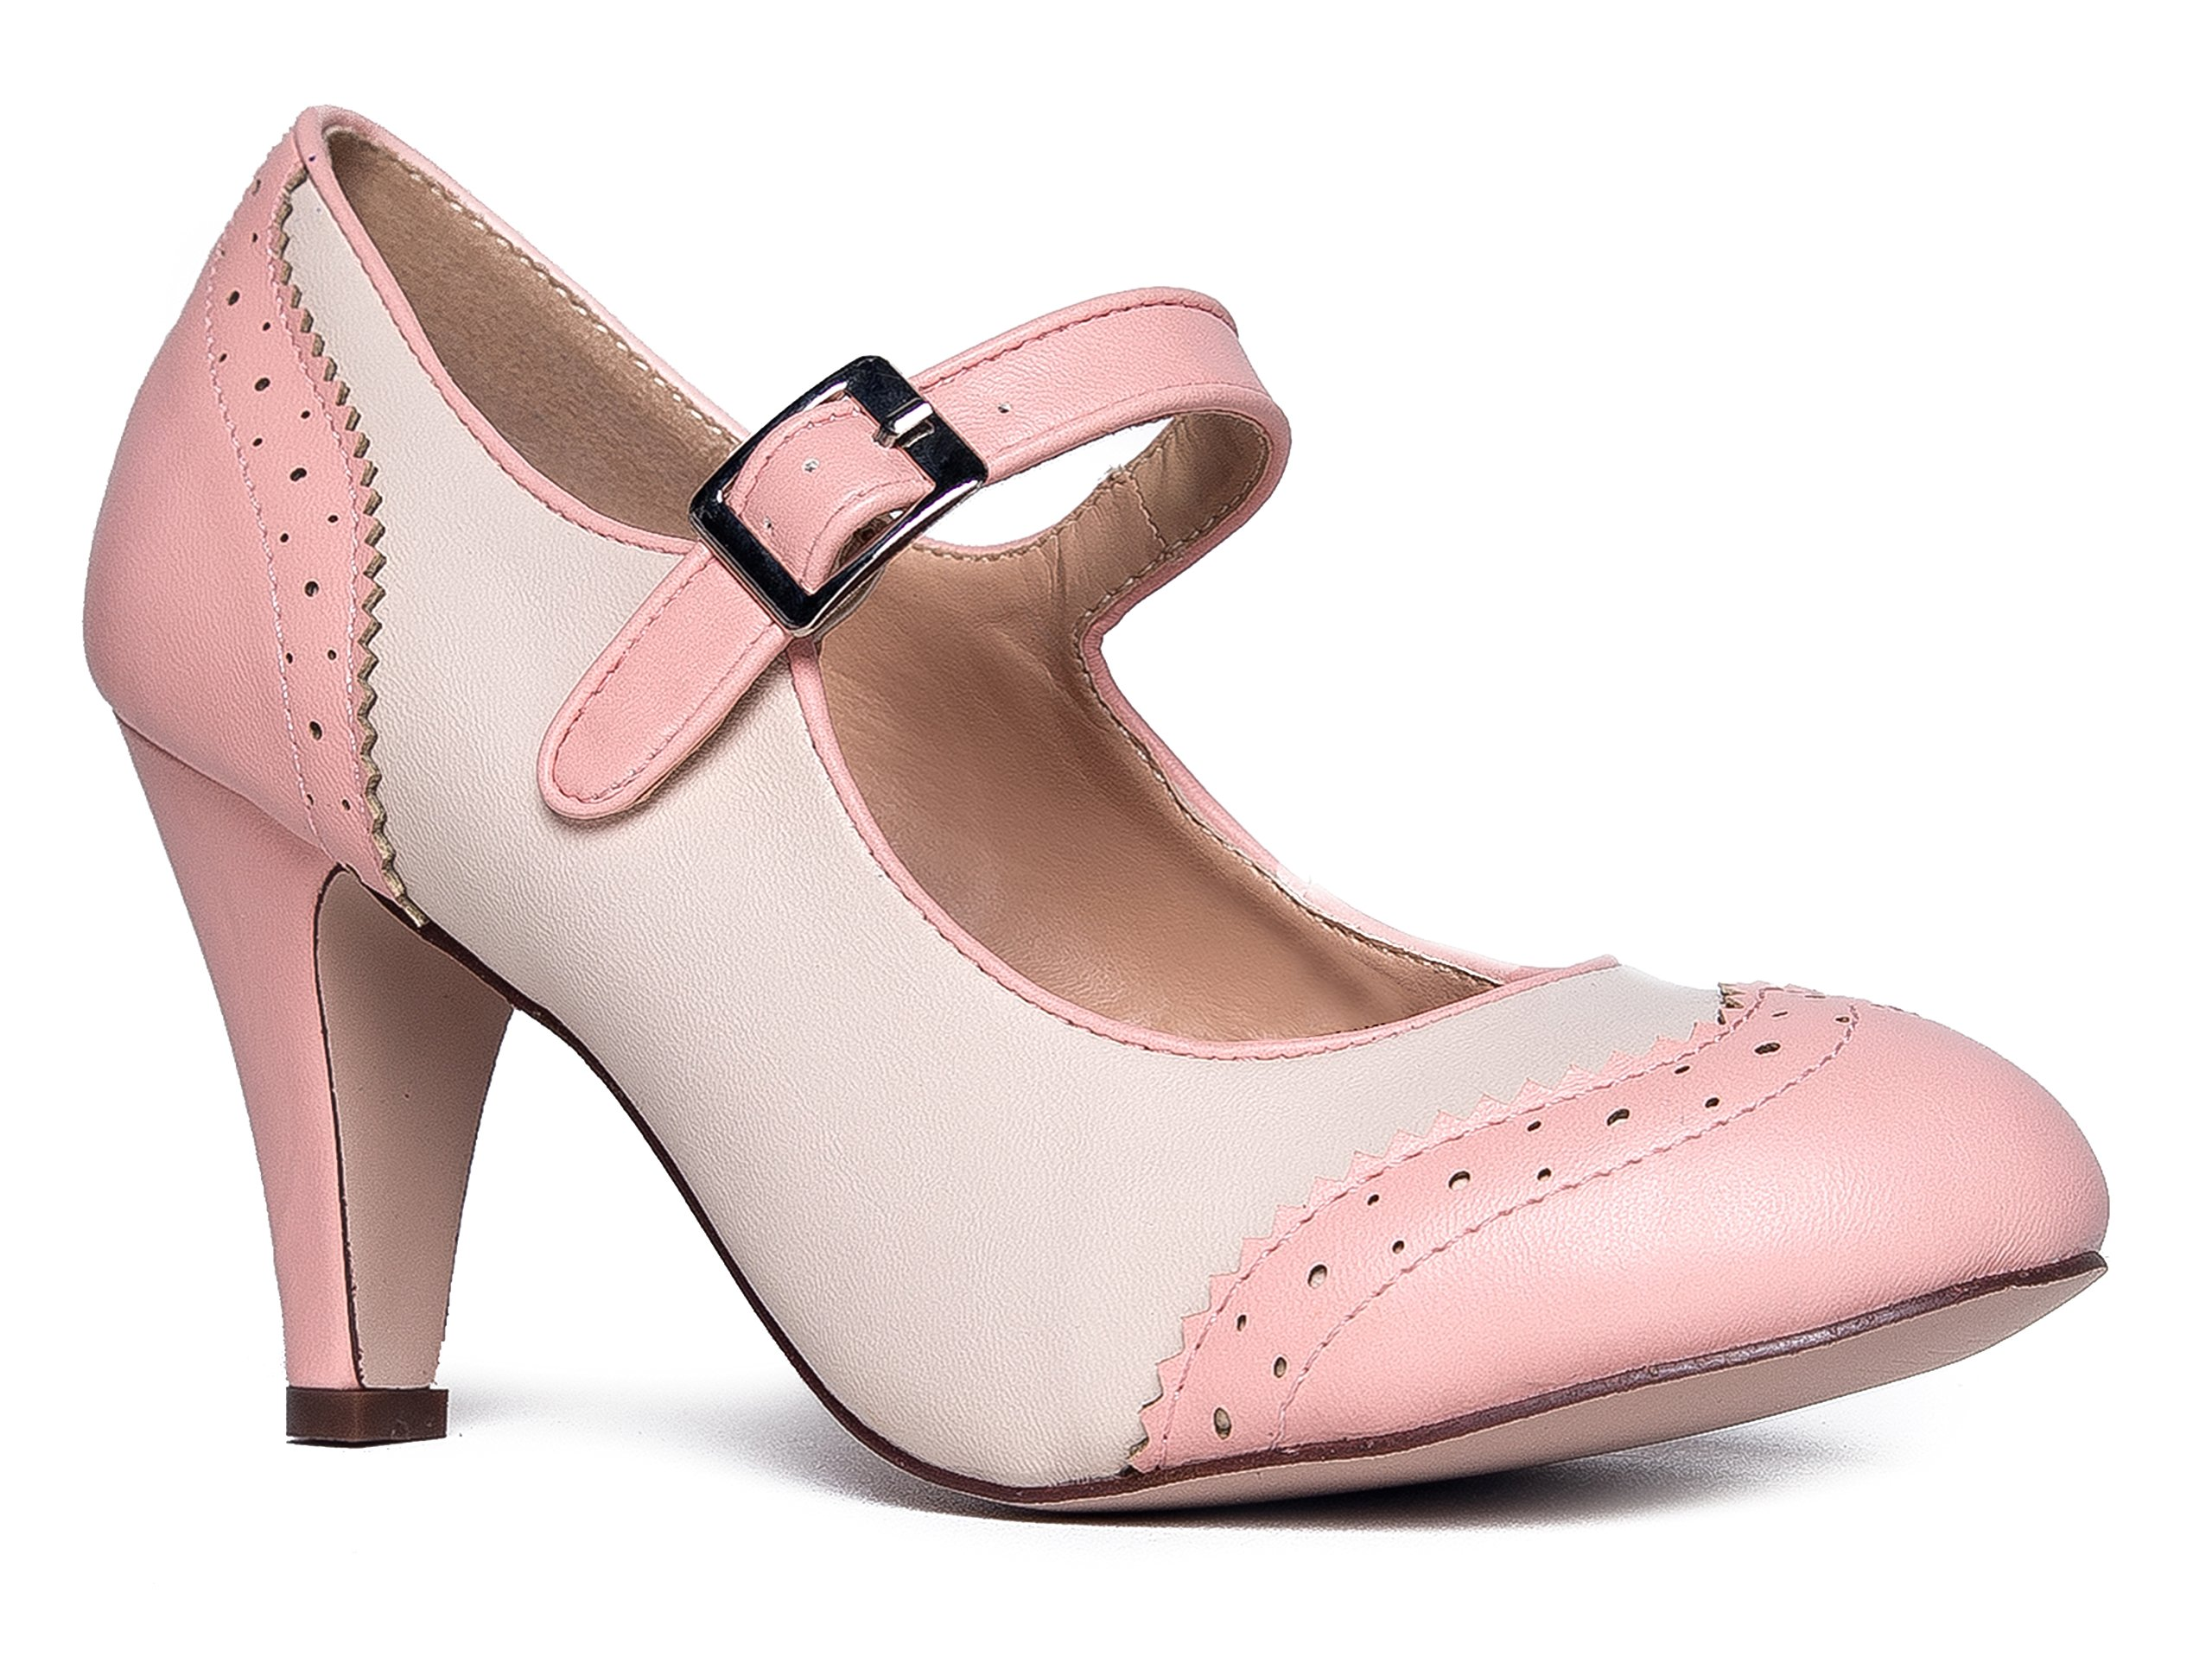 Kym Round Toe Oxford Heel, Pink Cream PU, 6.5 B(M) US